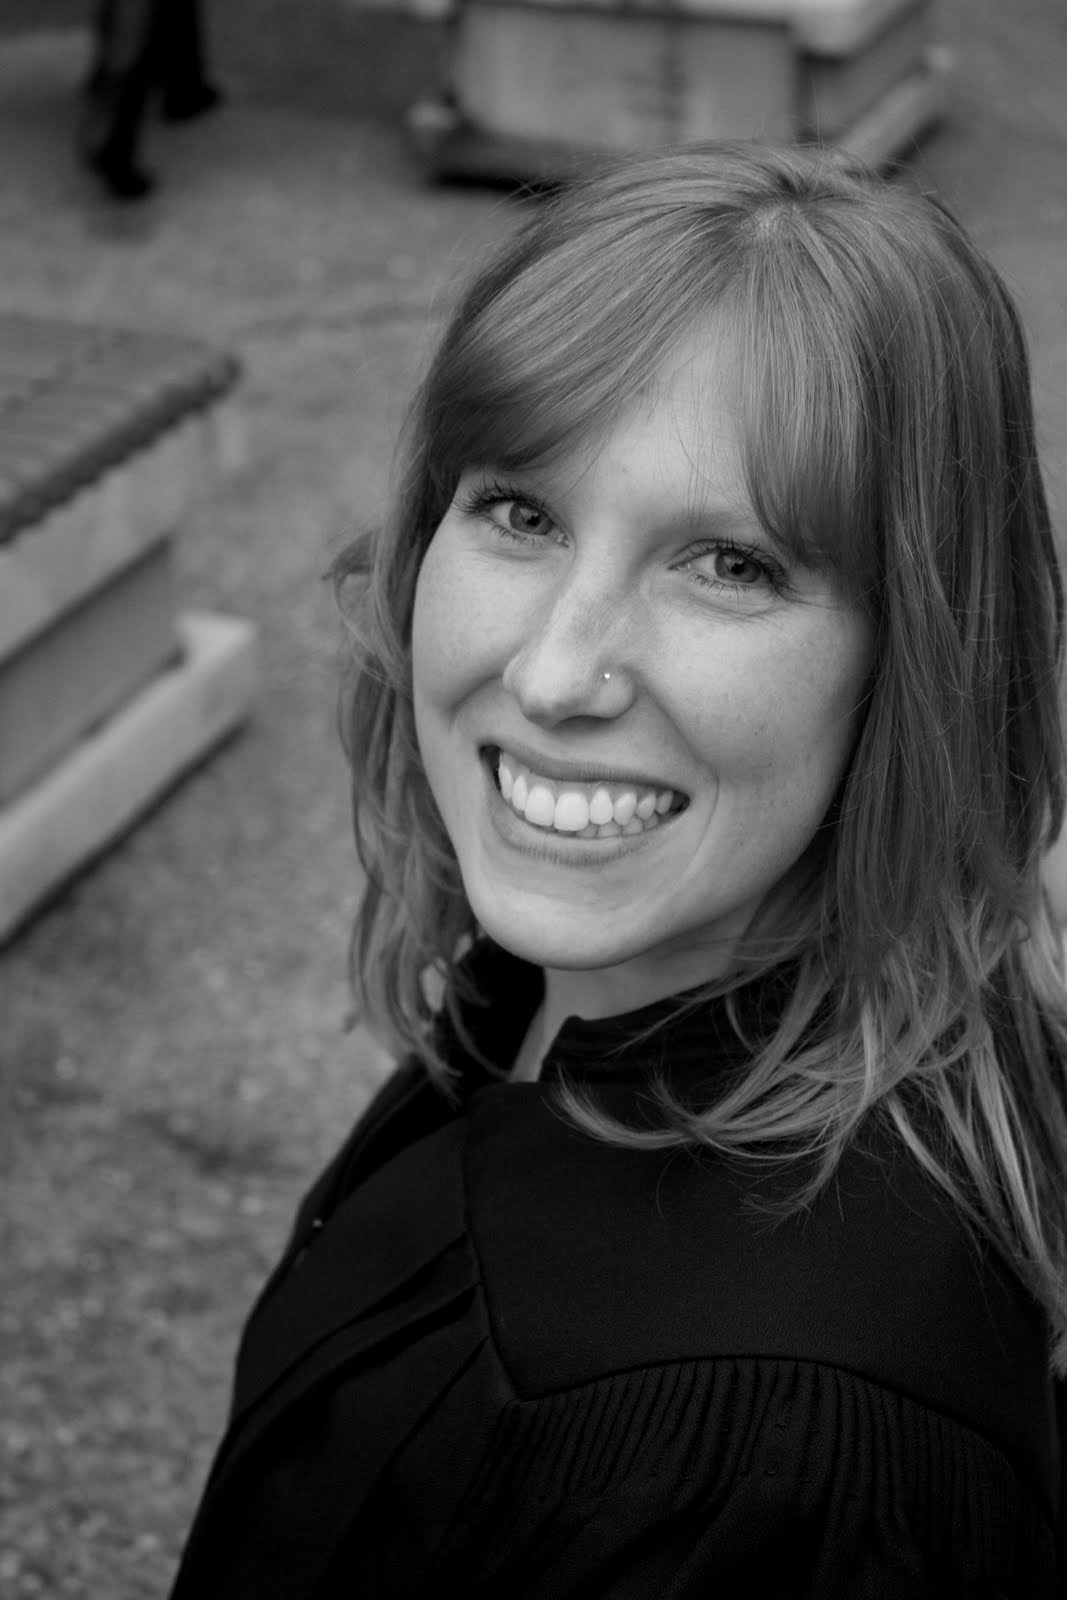 <B>Christina Ambrock</B><Br /><I></I><BR /><BR /><B>Areas of Work: </B>Medical, Ceremonial, Legal (Non-court), Platform, Social Services, Technical, VRI, Employment, Education